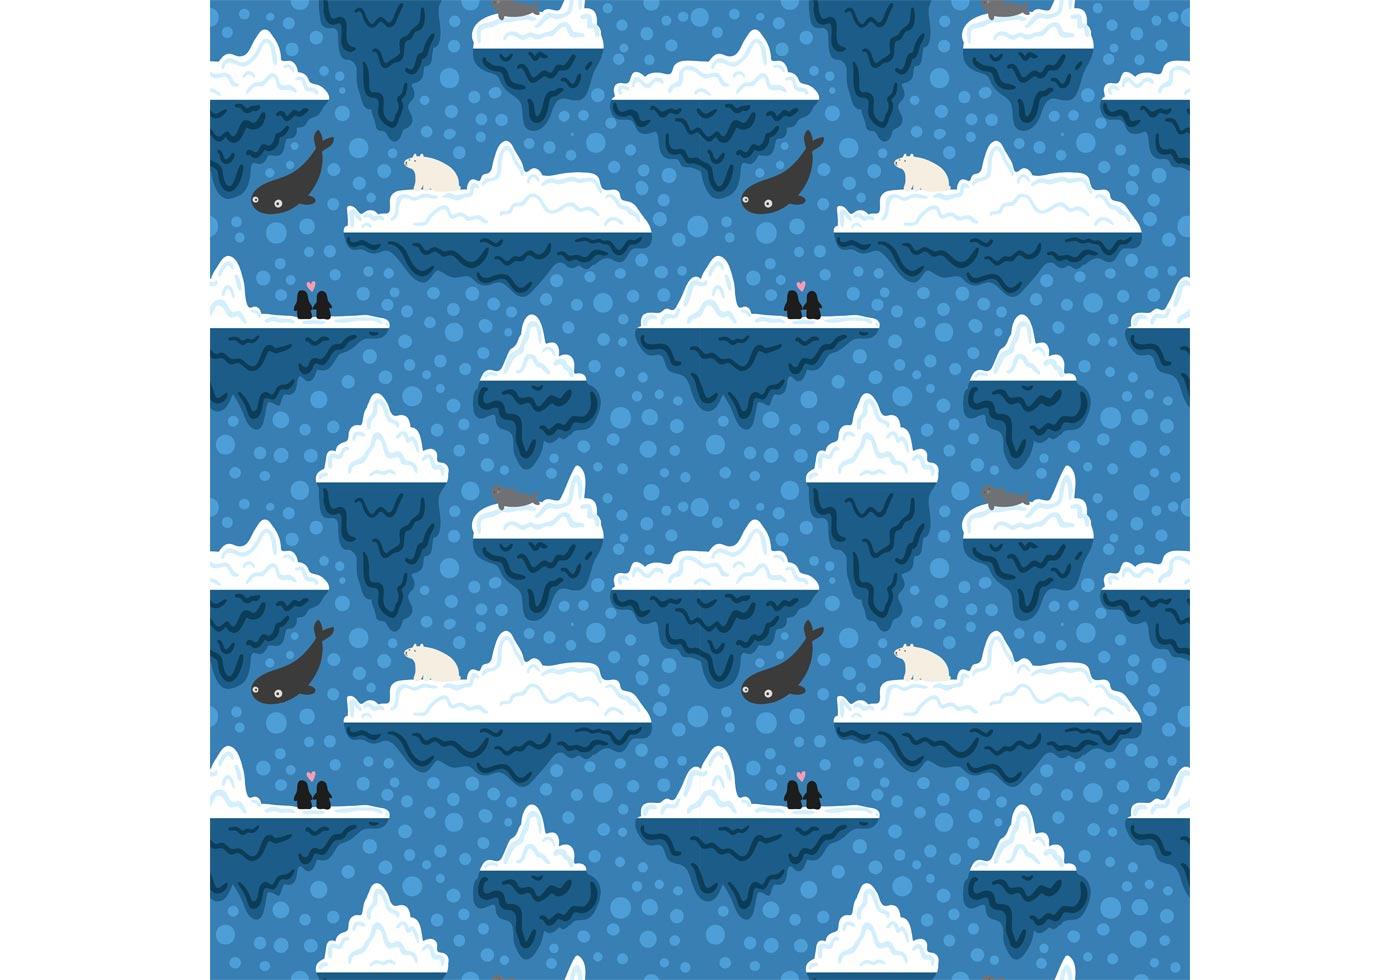 Cute Penguin Wallpaper Cartoon Free Iceberg Underwater Pattern Vector Download Free